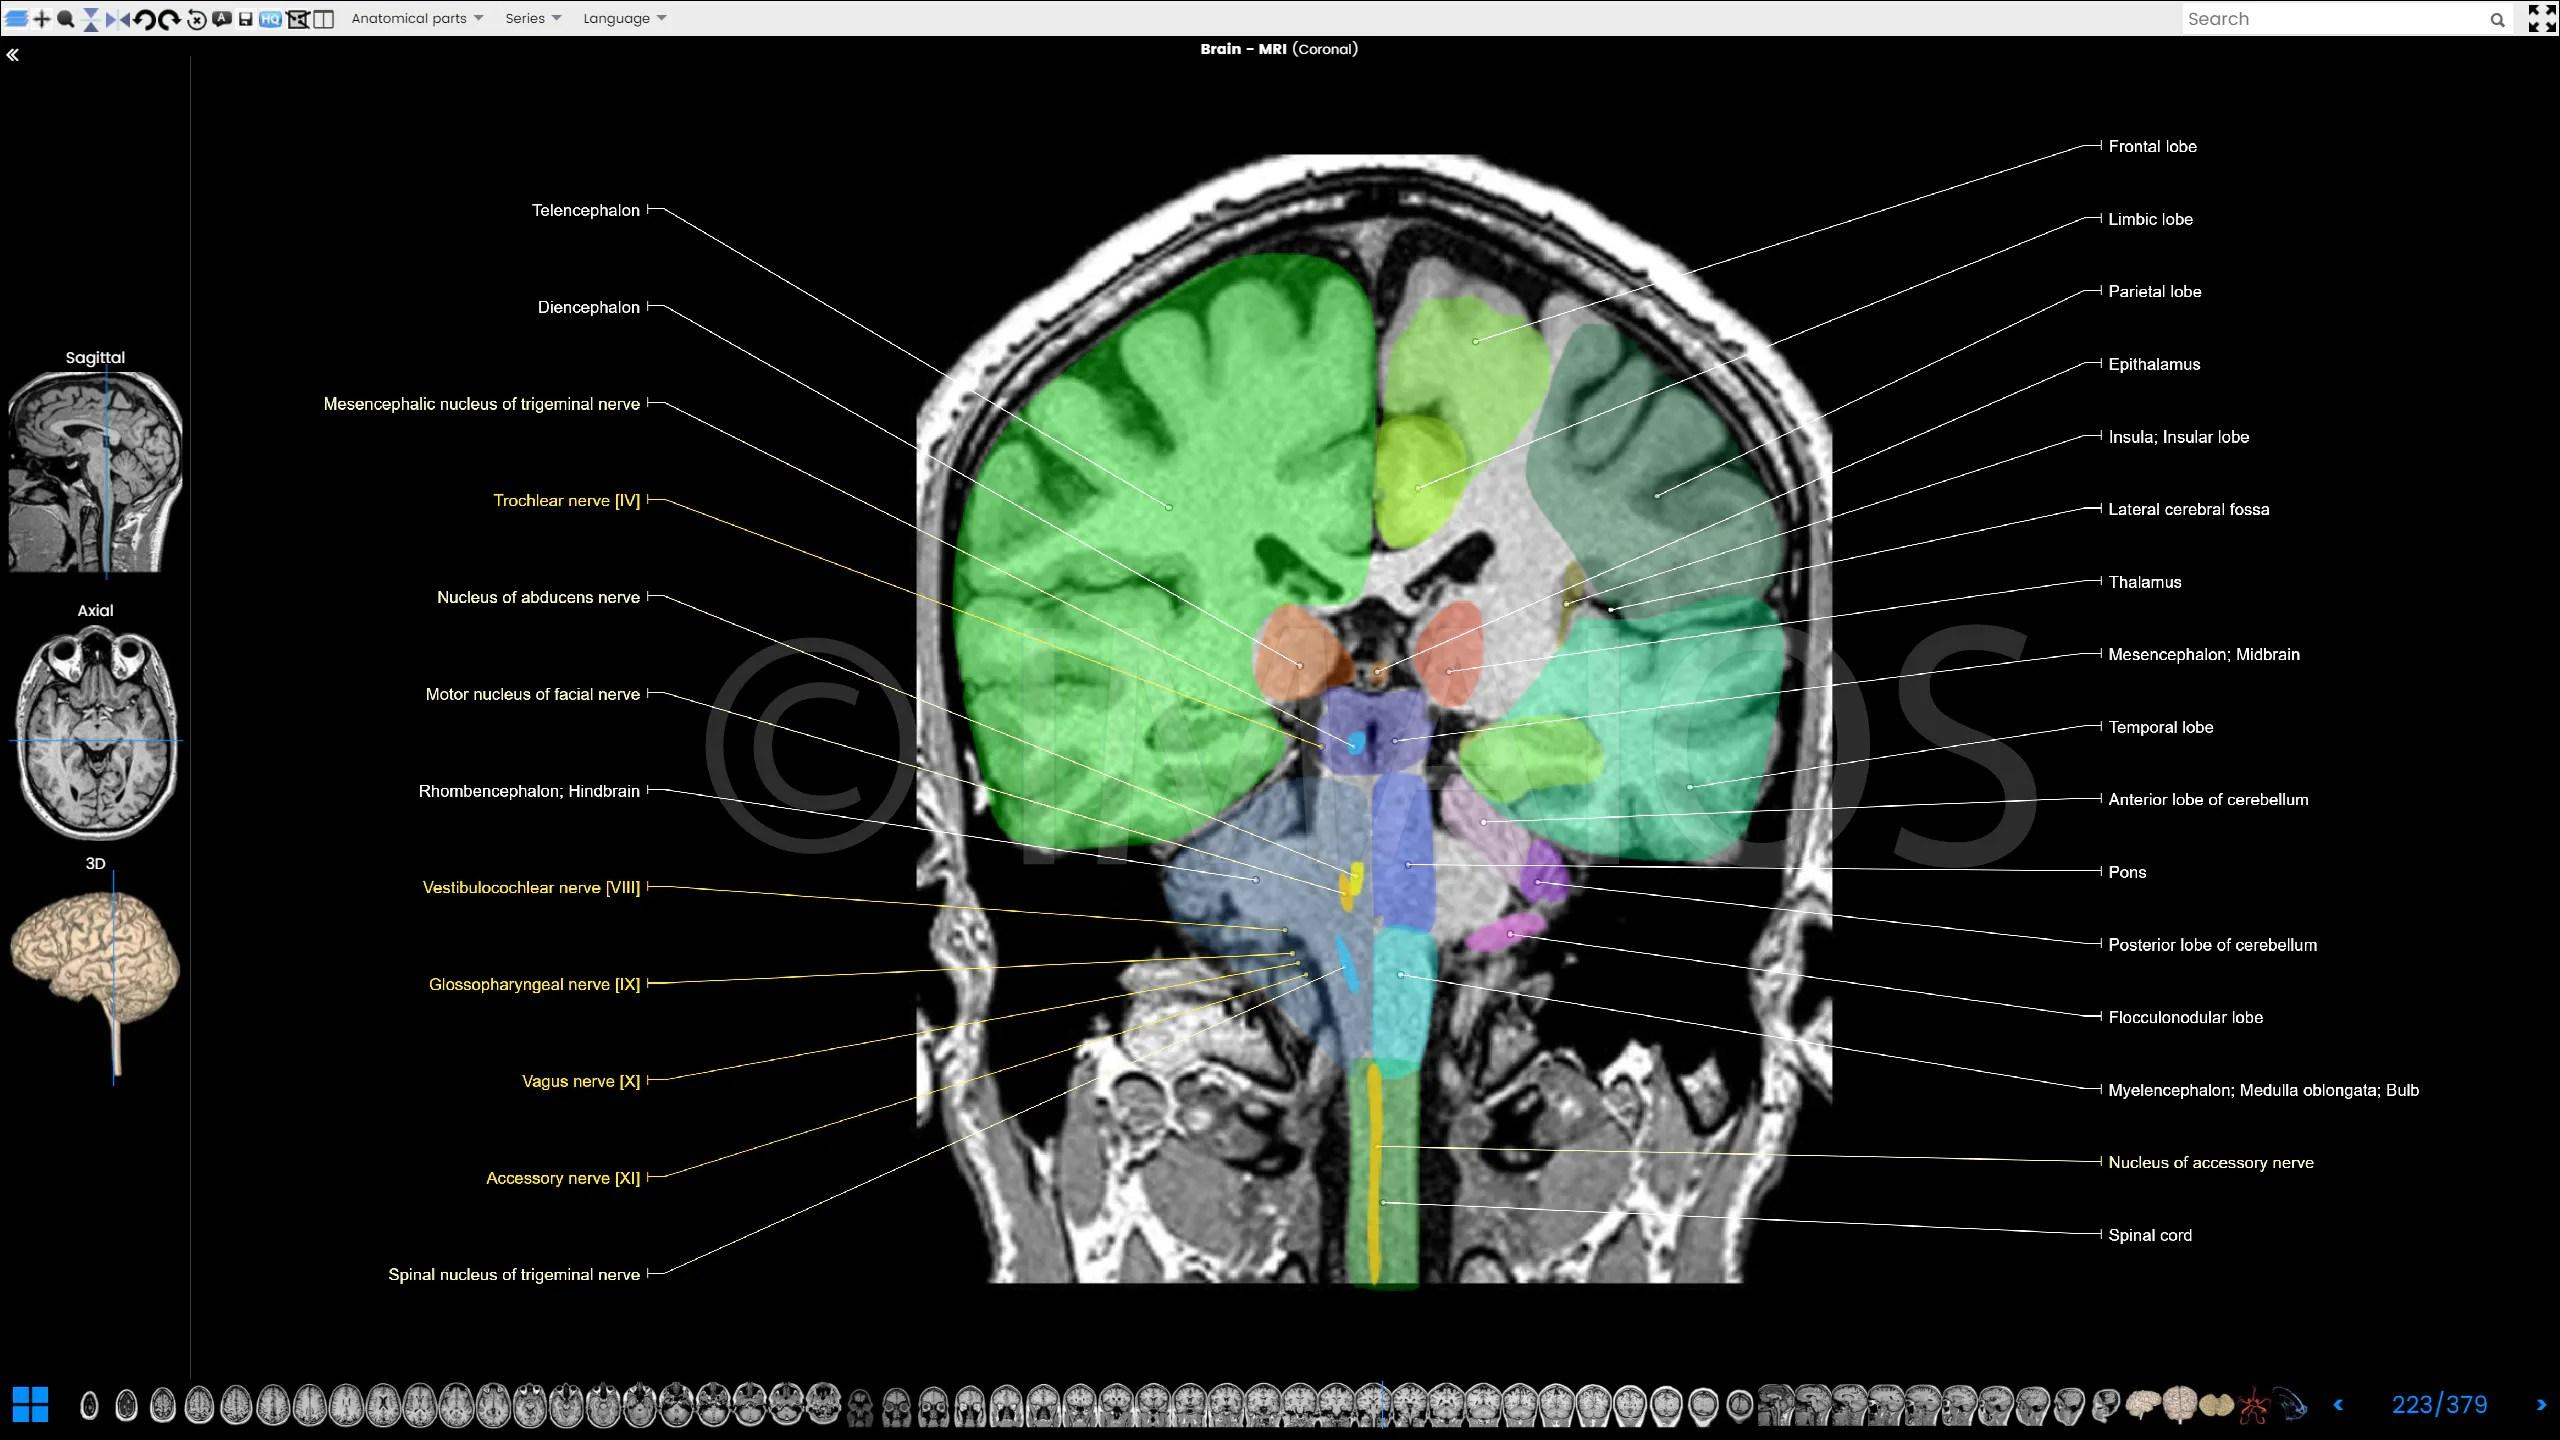 Wallpaper Seram 3d Brain Atlas Of Human Anatomy With Mri